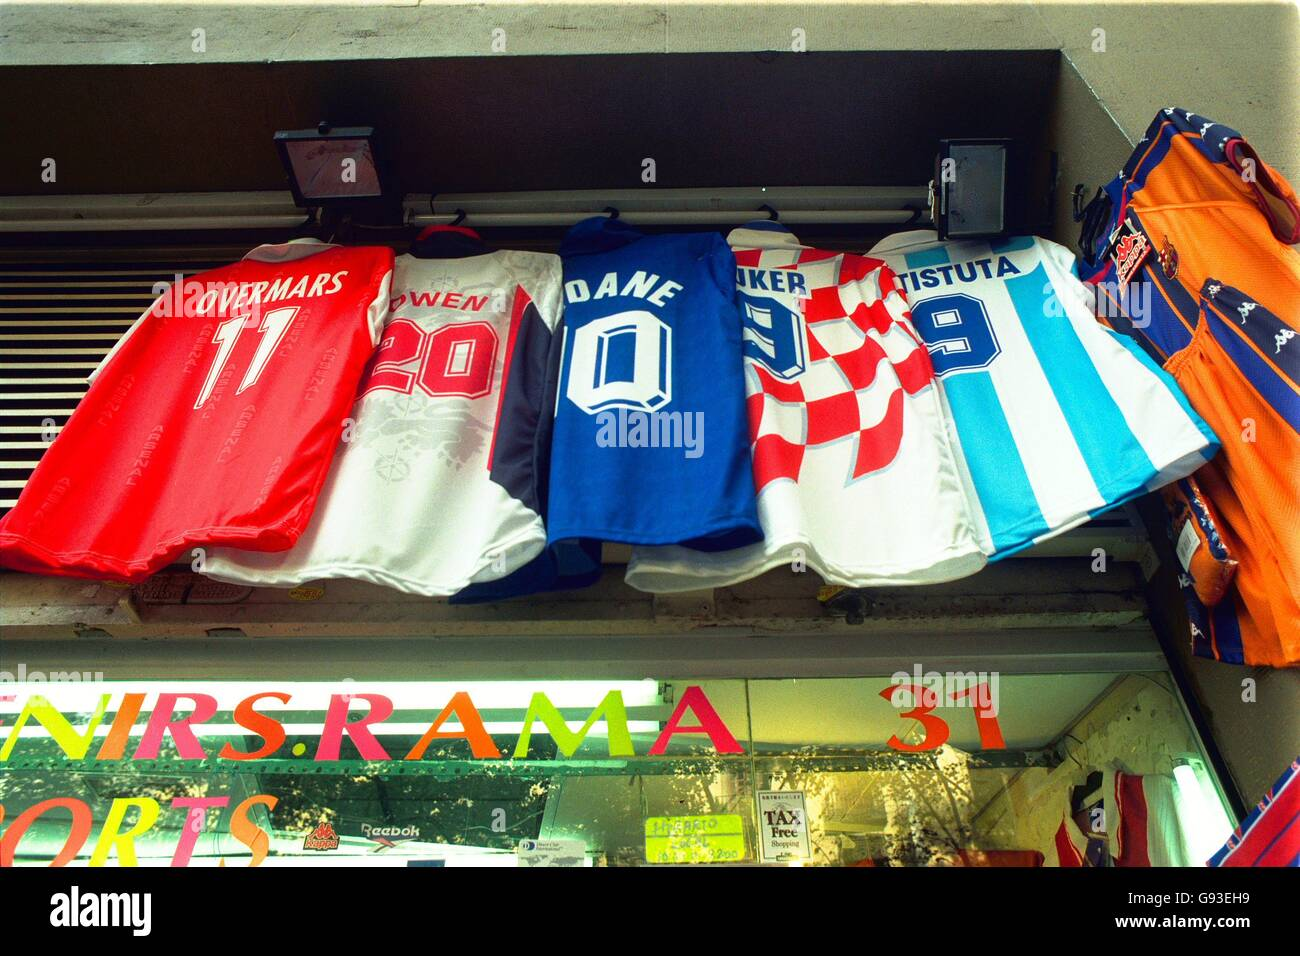 Spanish Soccer - Barcelona Club Shop - Stock Image